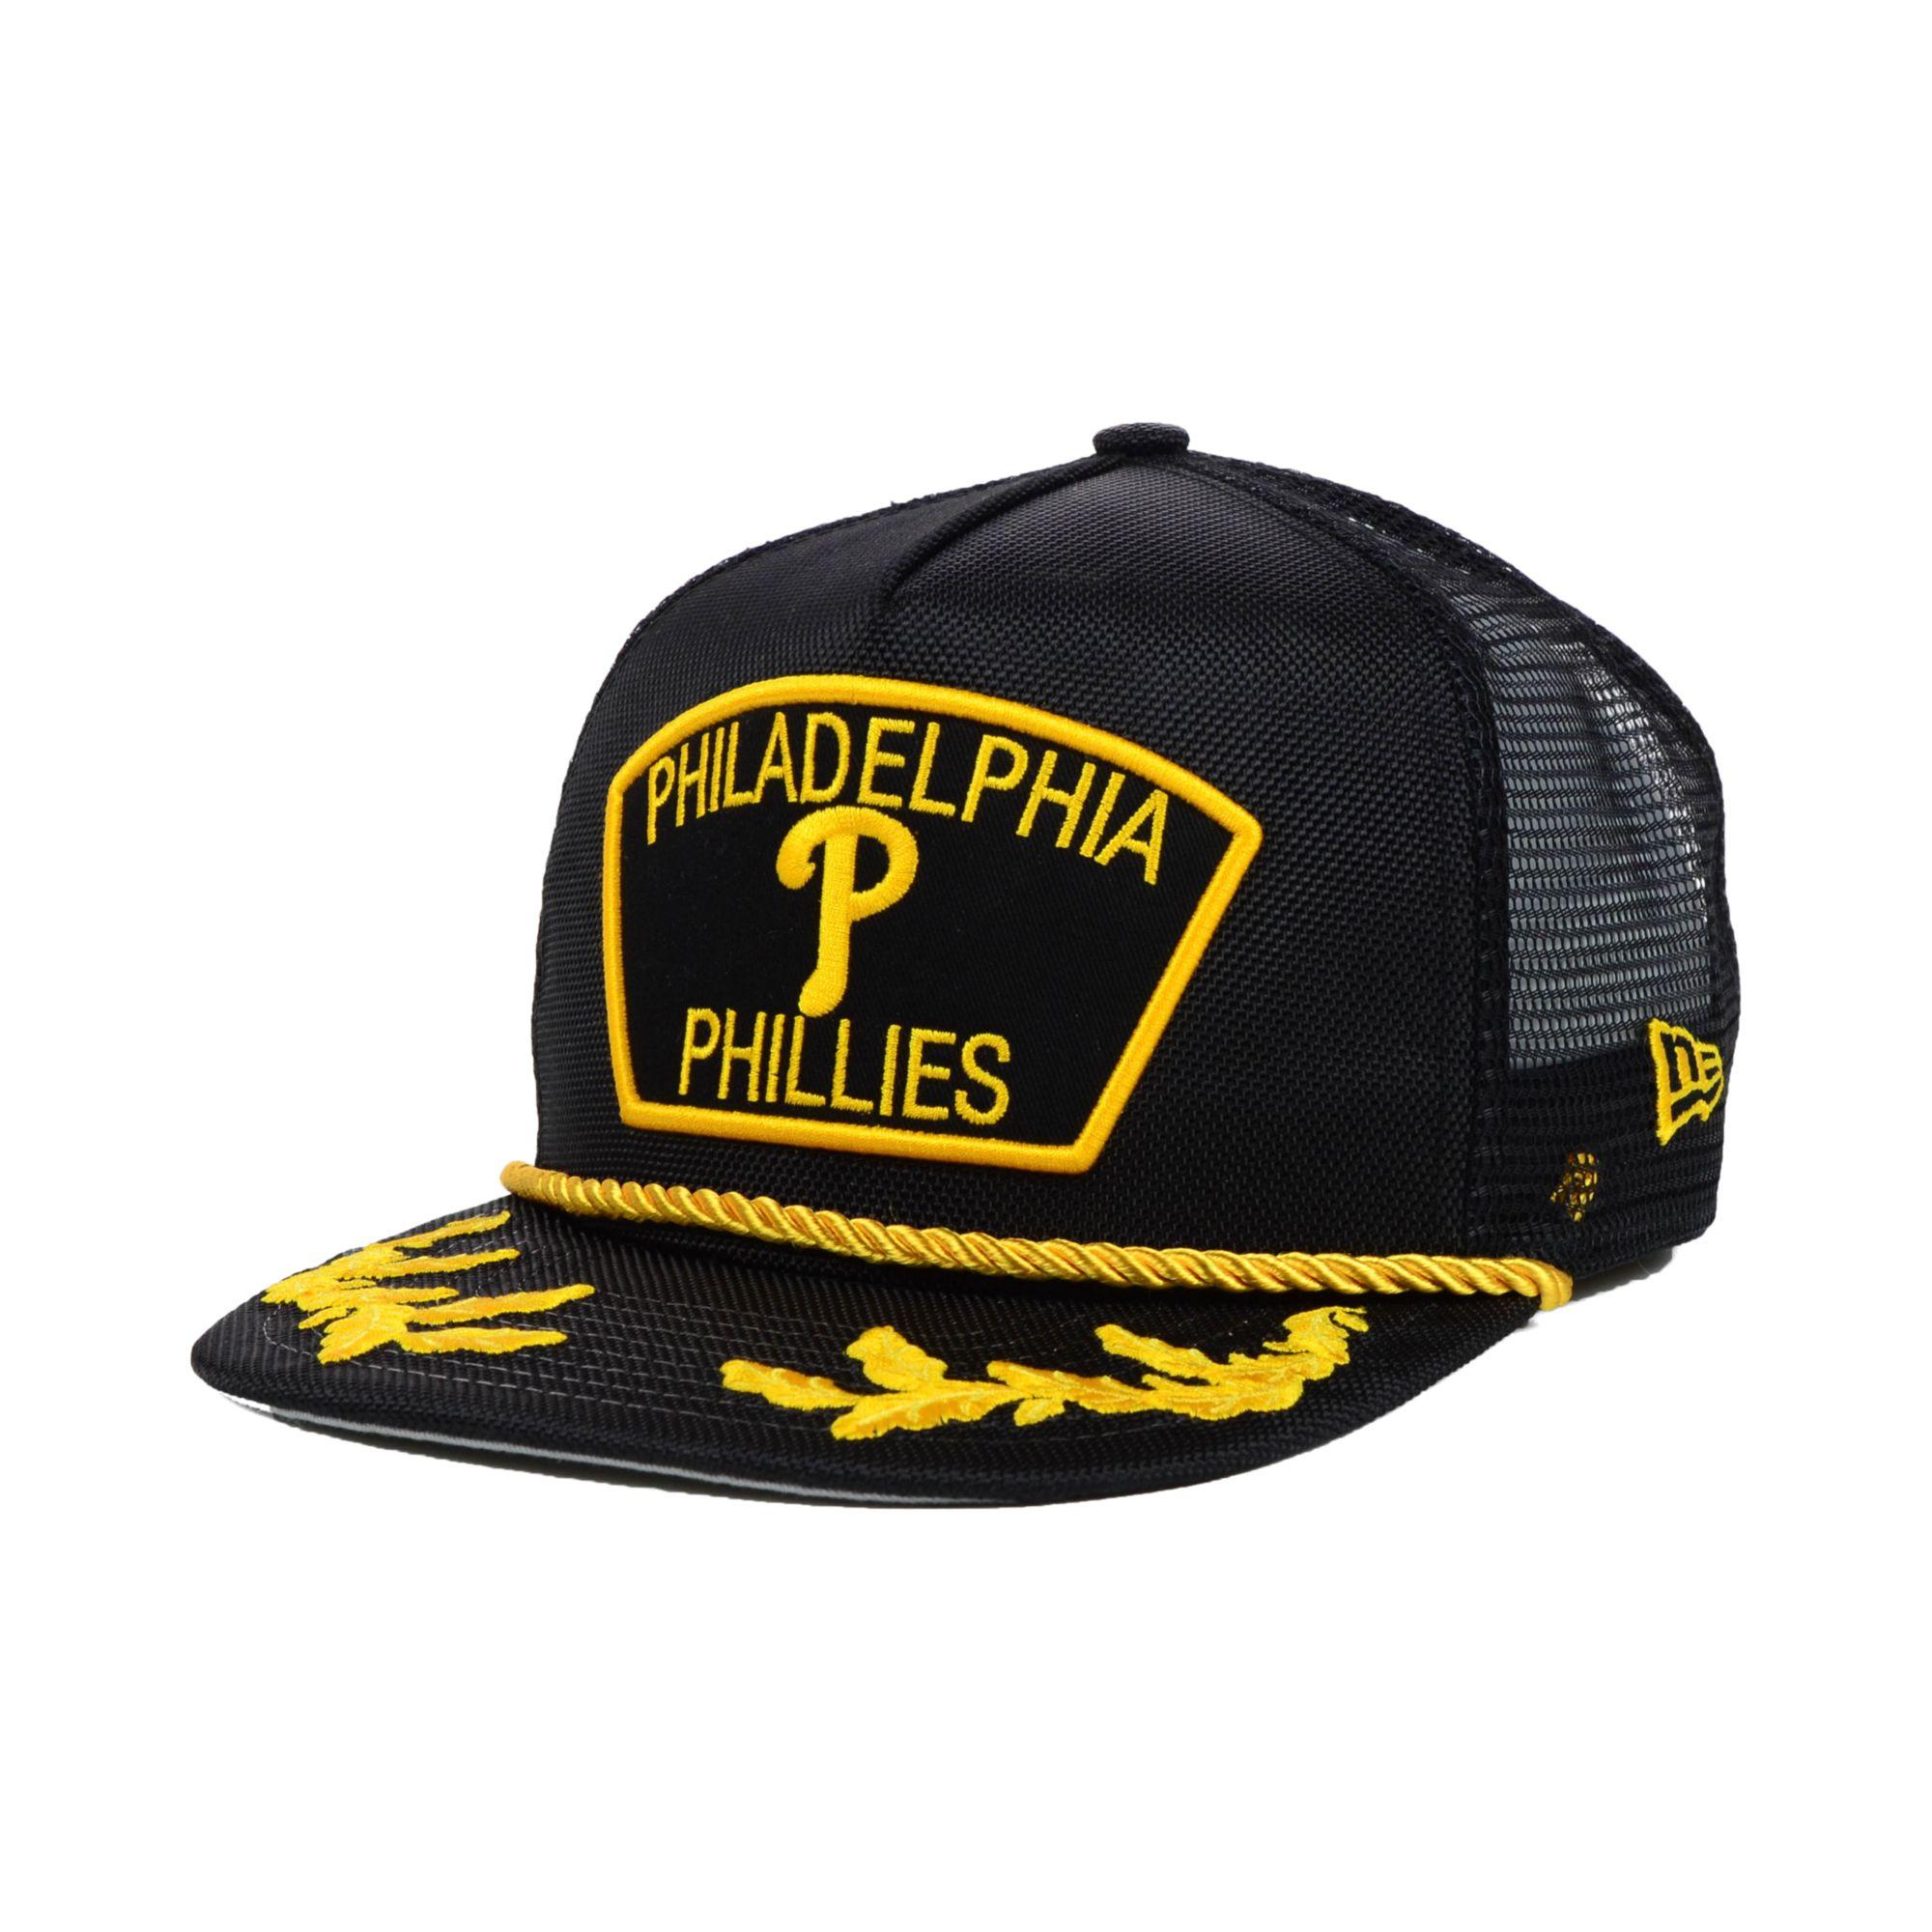 new product c2c87 a2e4c promo code lyst ktz philadelphia phillies mlb 9fifty snapback cap in black  2b508 b4d30